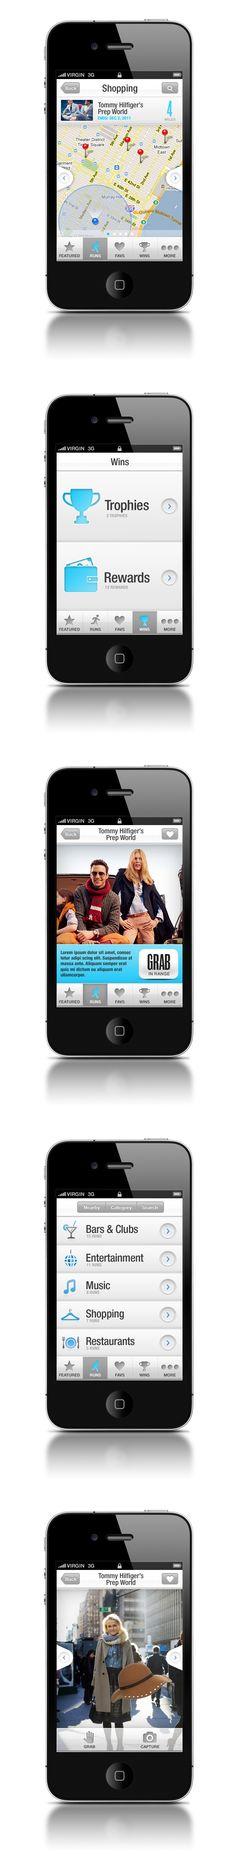 Goldrun V2 on Behance #mobile #ui #ux #design #inspiration #navigation #app #interface #ios #android #flat #smartphone #visual